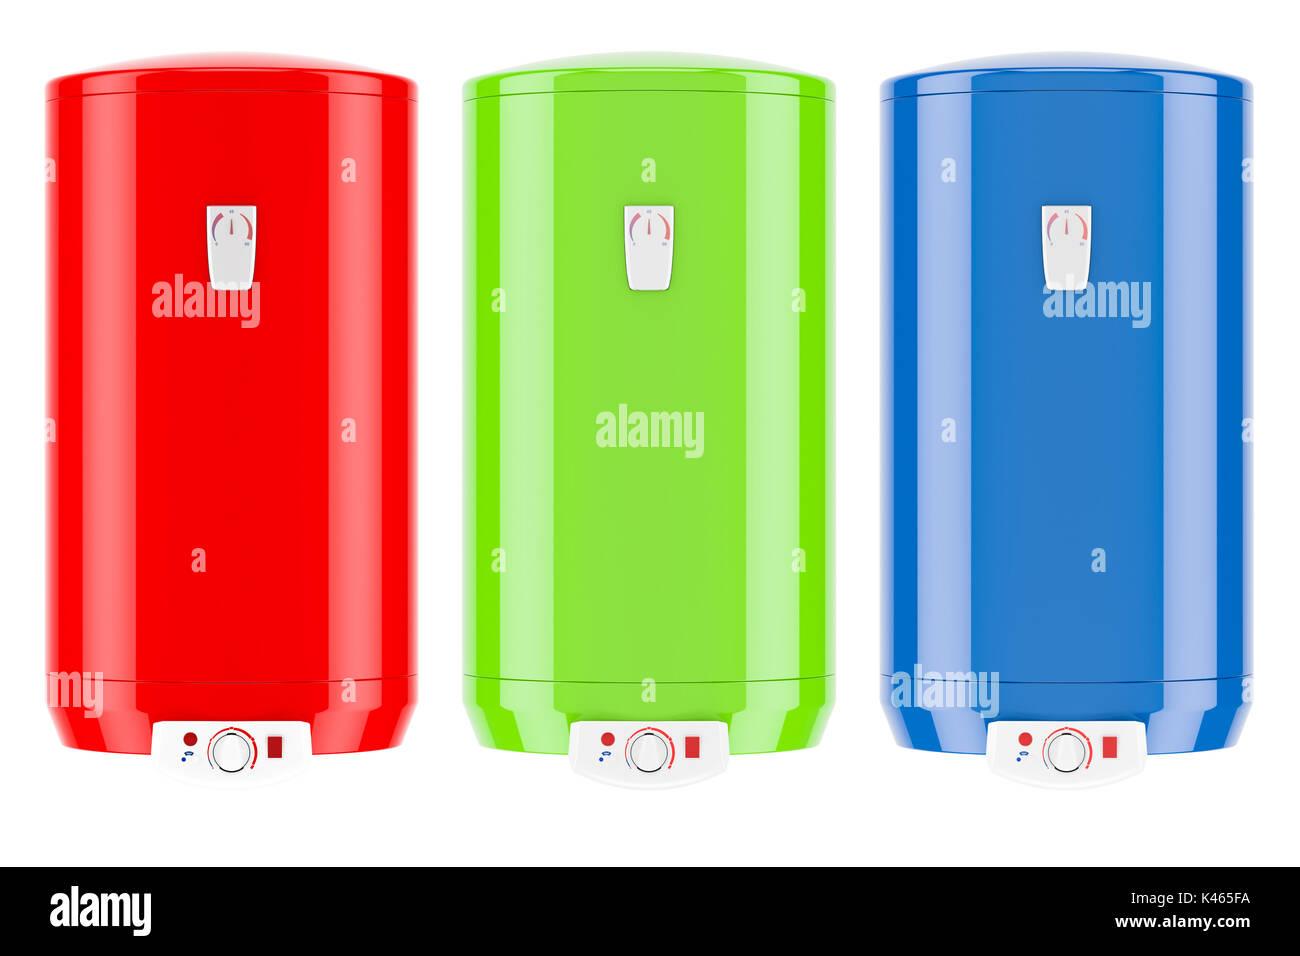 Conjunto de calentadores de agua eléctricos de color o calderas, 3D rendering aislado sobre fondo blanco. Imagen De Stock